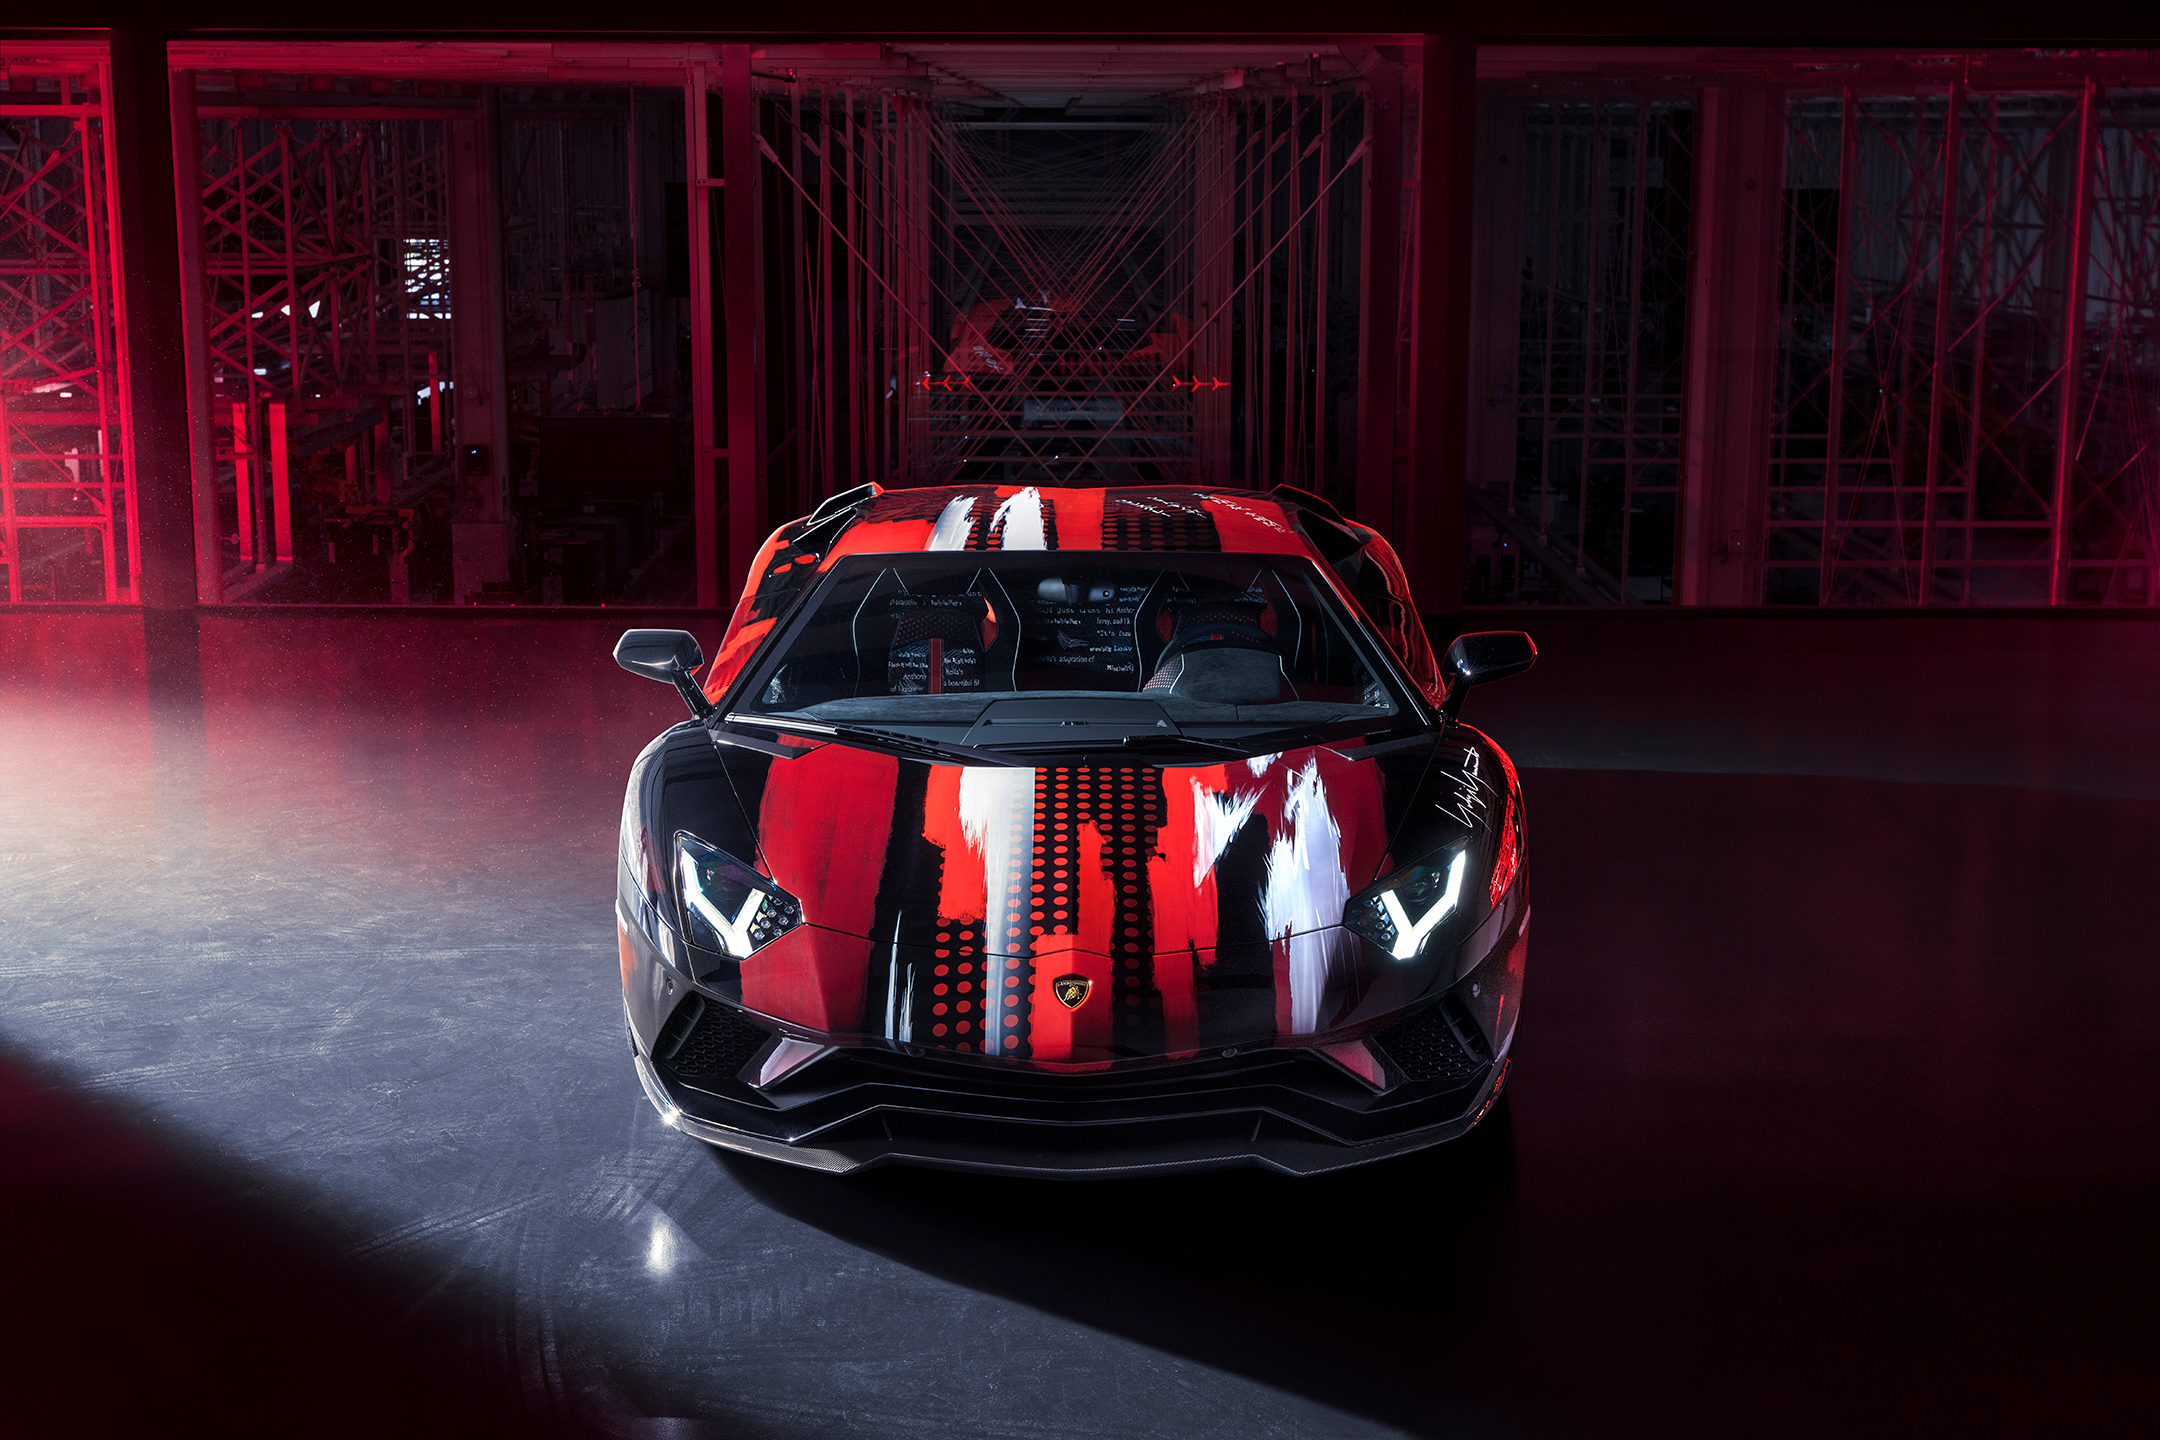 Lamborghini Aventador S x Yohji Yamamoto fashion designer - 2020 - front-face / face avant